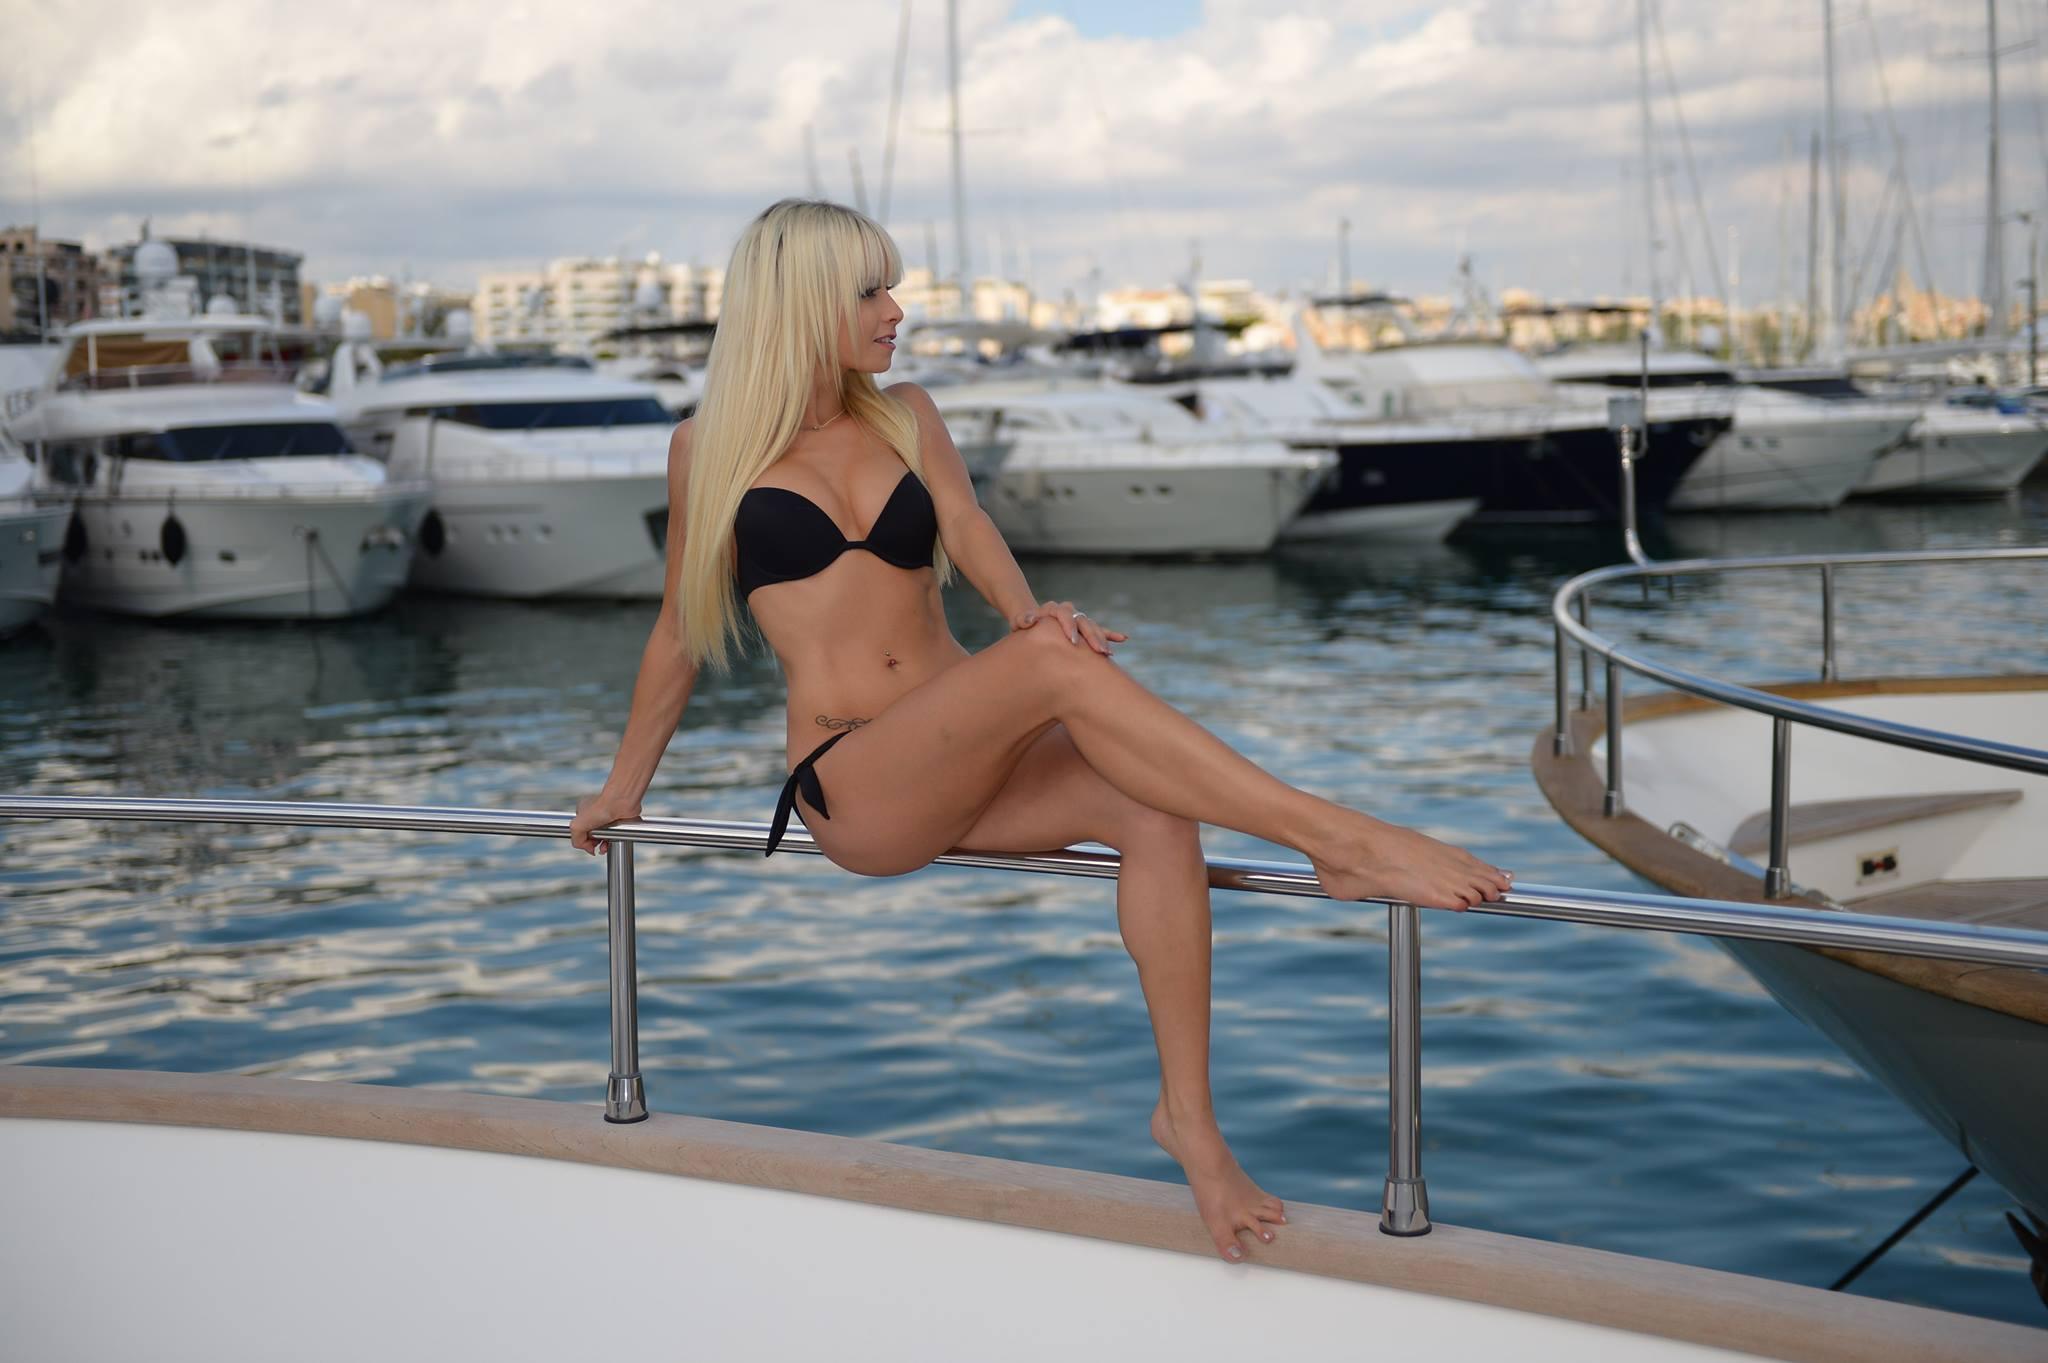 Feet Mia Julia Bruckner naked (53 foto and video), Ass, Paparazzi, Selfie, braless 2006